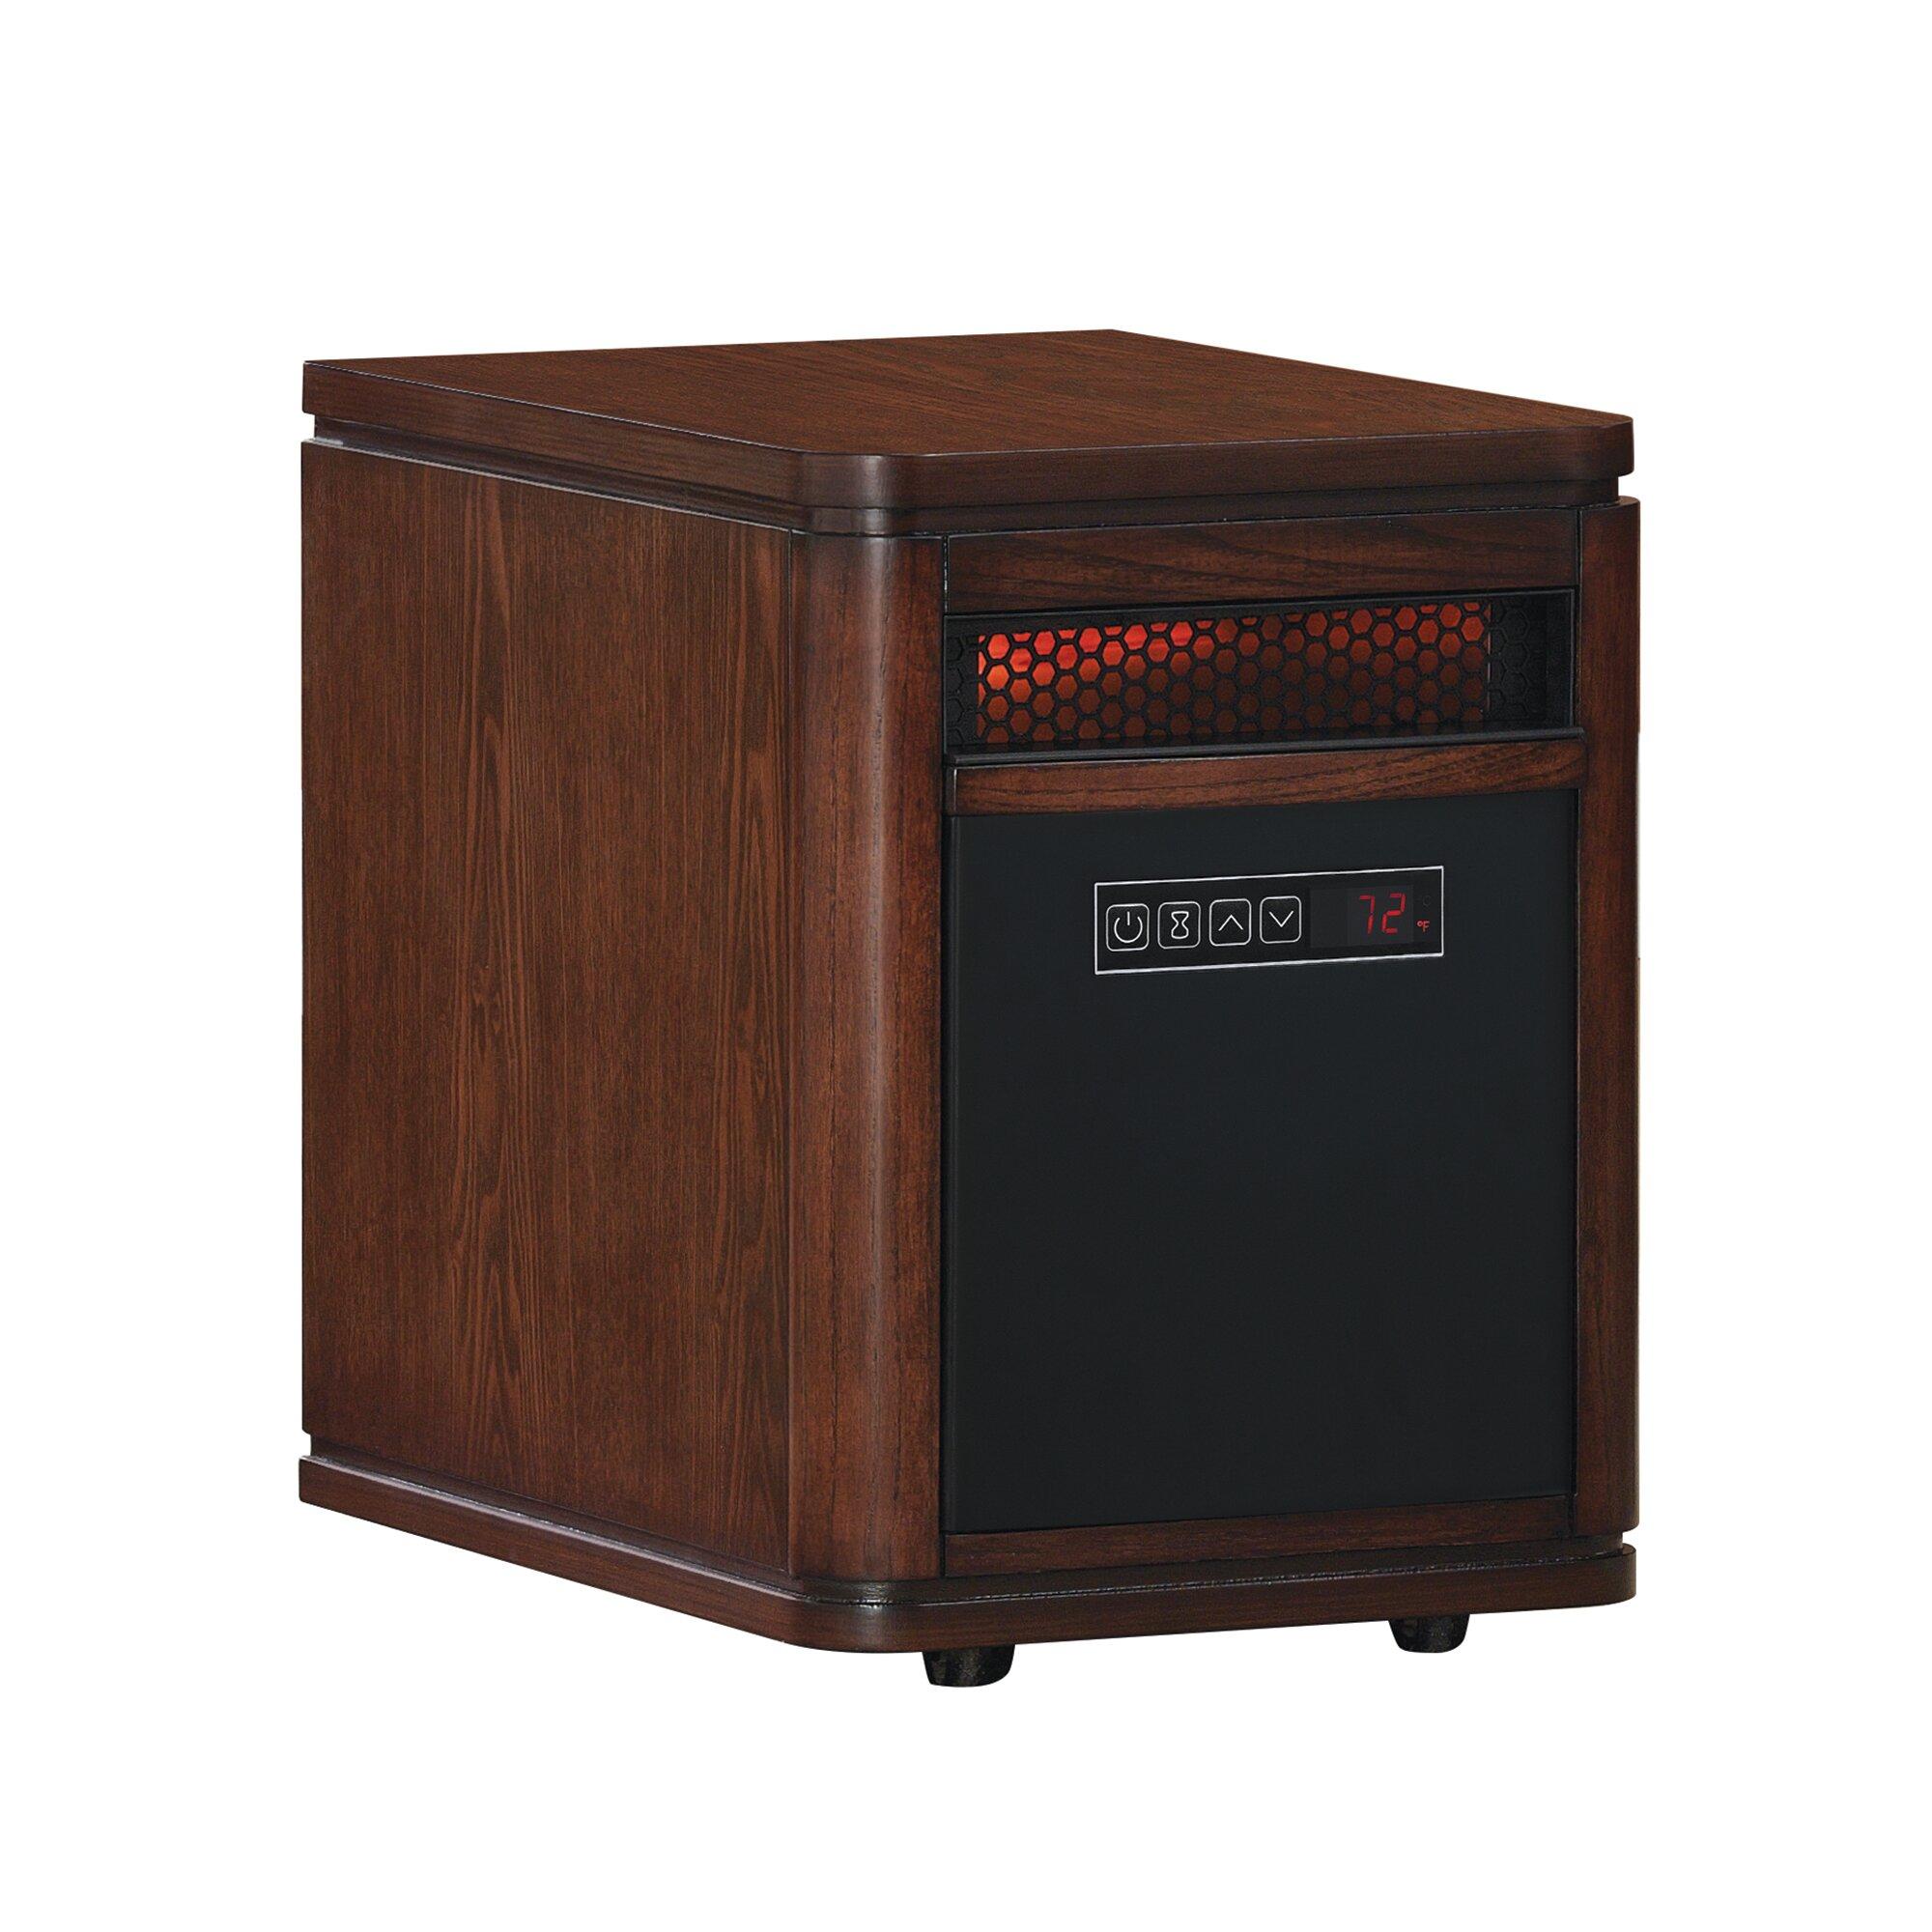 Duraflame 5 200 Btu Portable Electric Infrared Cabinet